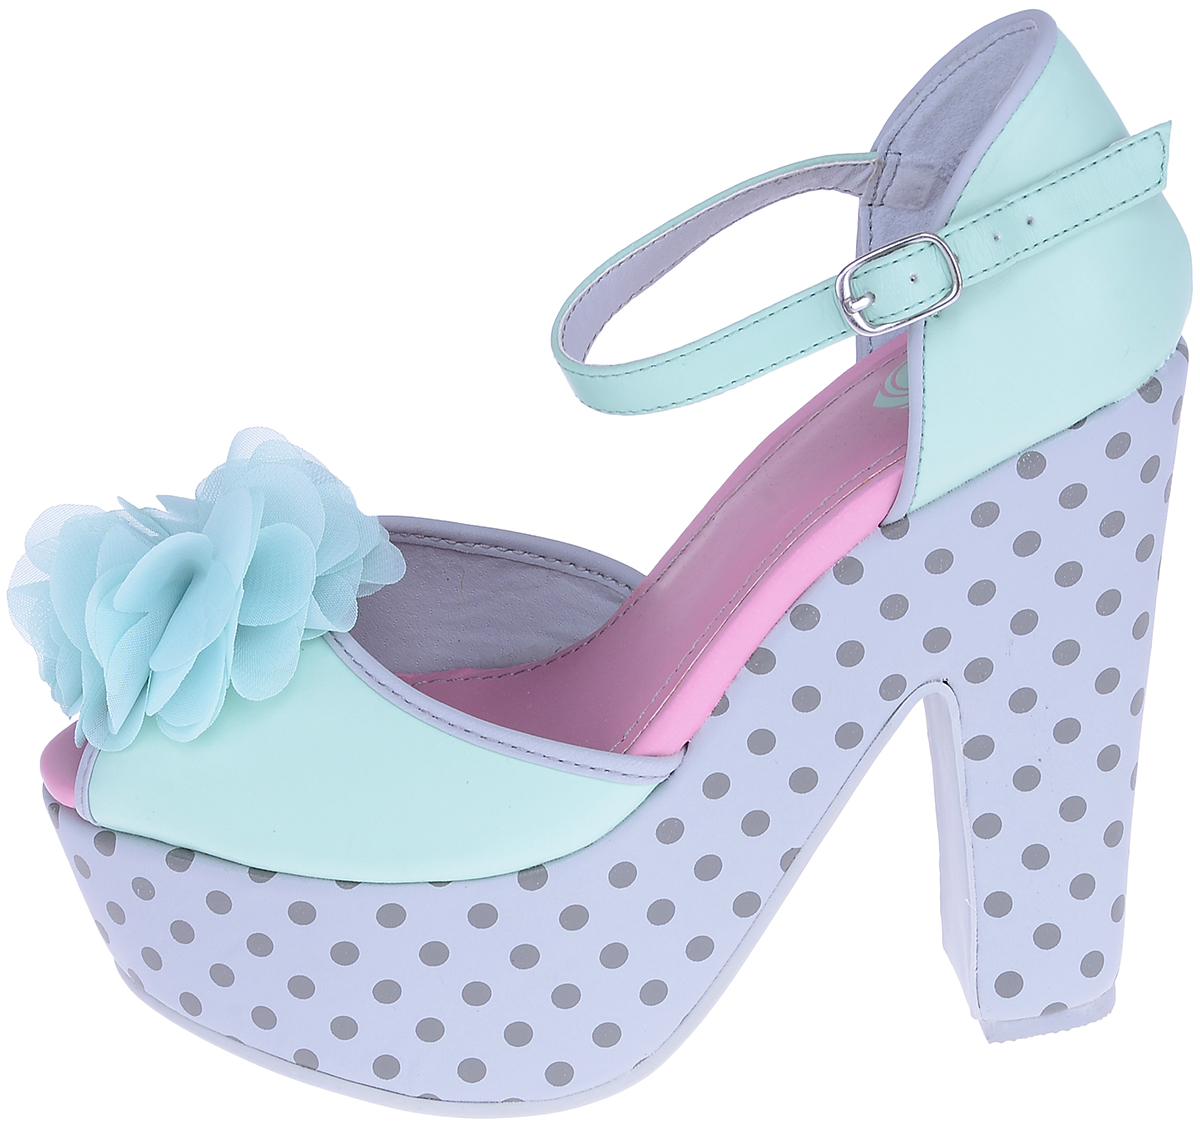 t u k chiffon flower mimi mint polk dots wedge heels pumps rockabilly ebay. Black Bedroom Furniture Sets. Home Design Ideas